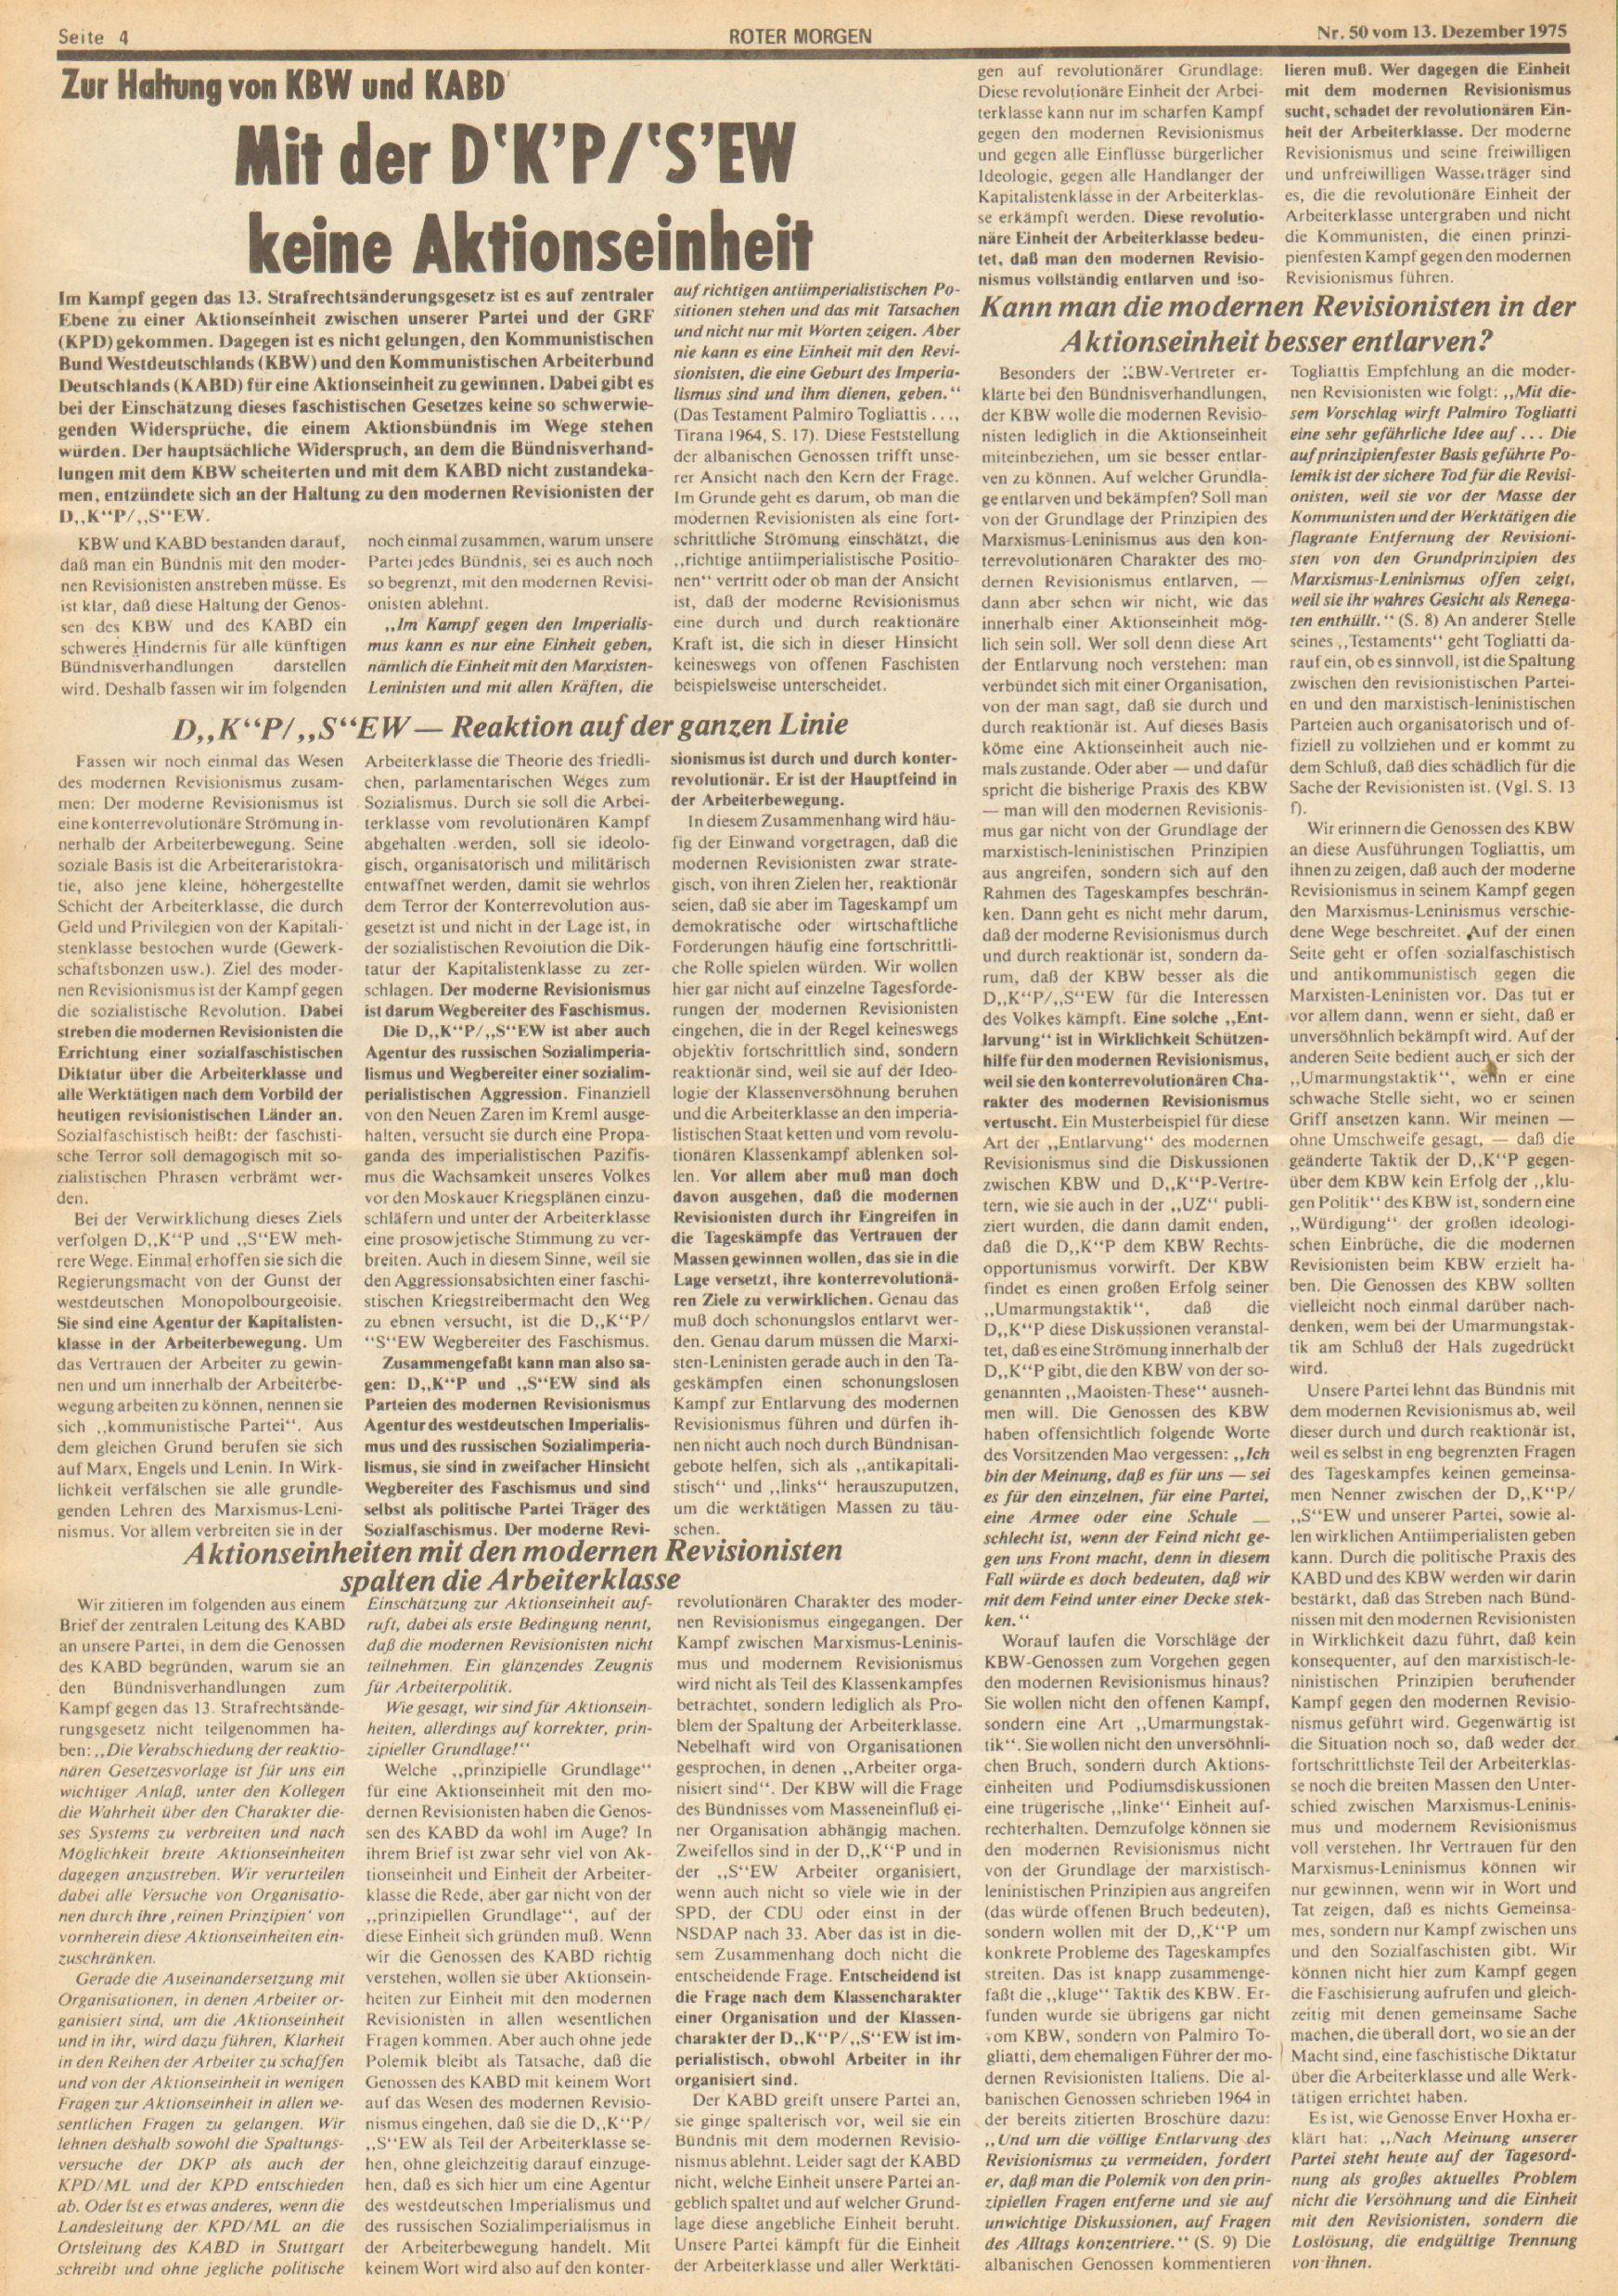 Roter Morgen, 9. Jg., 13. Dezember 1975, Nr. 50, Seite 4